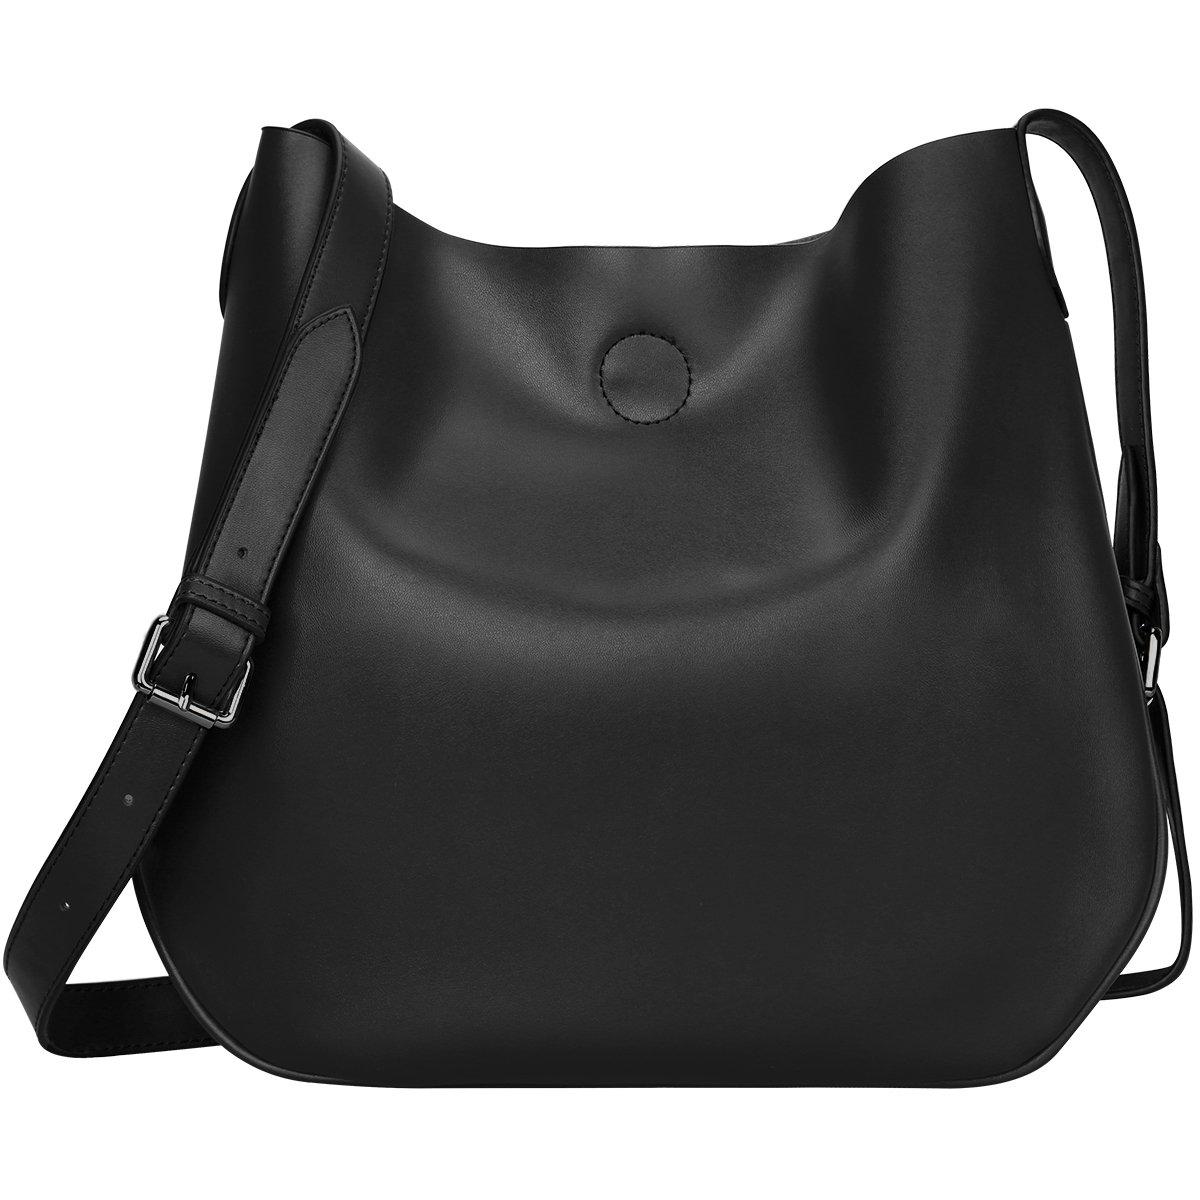 7b78a13e7d7d S-ZONE Leather Crossbody Bag Slim Shoulder Bag Medium Drew Purse for Women  Ladies